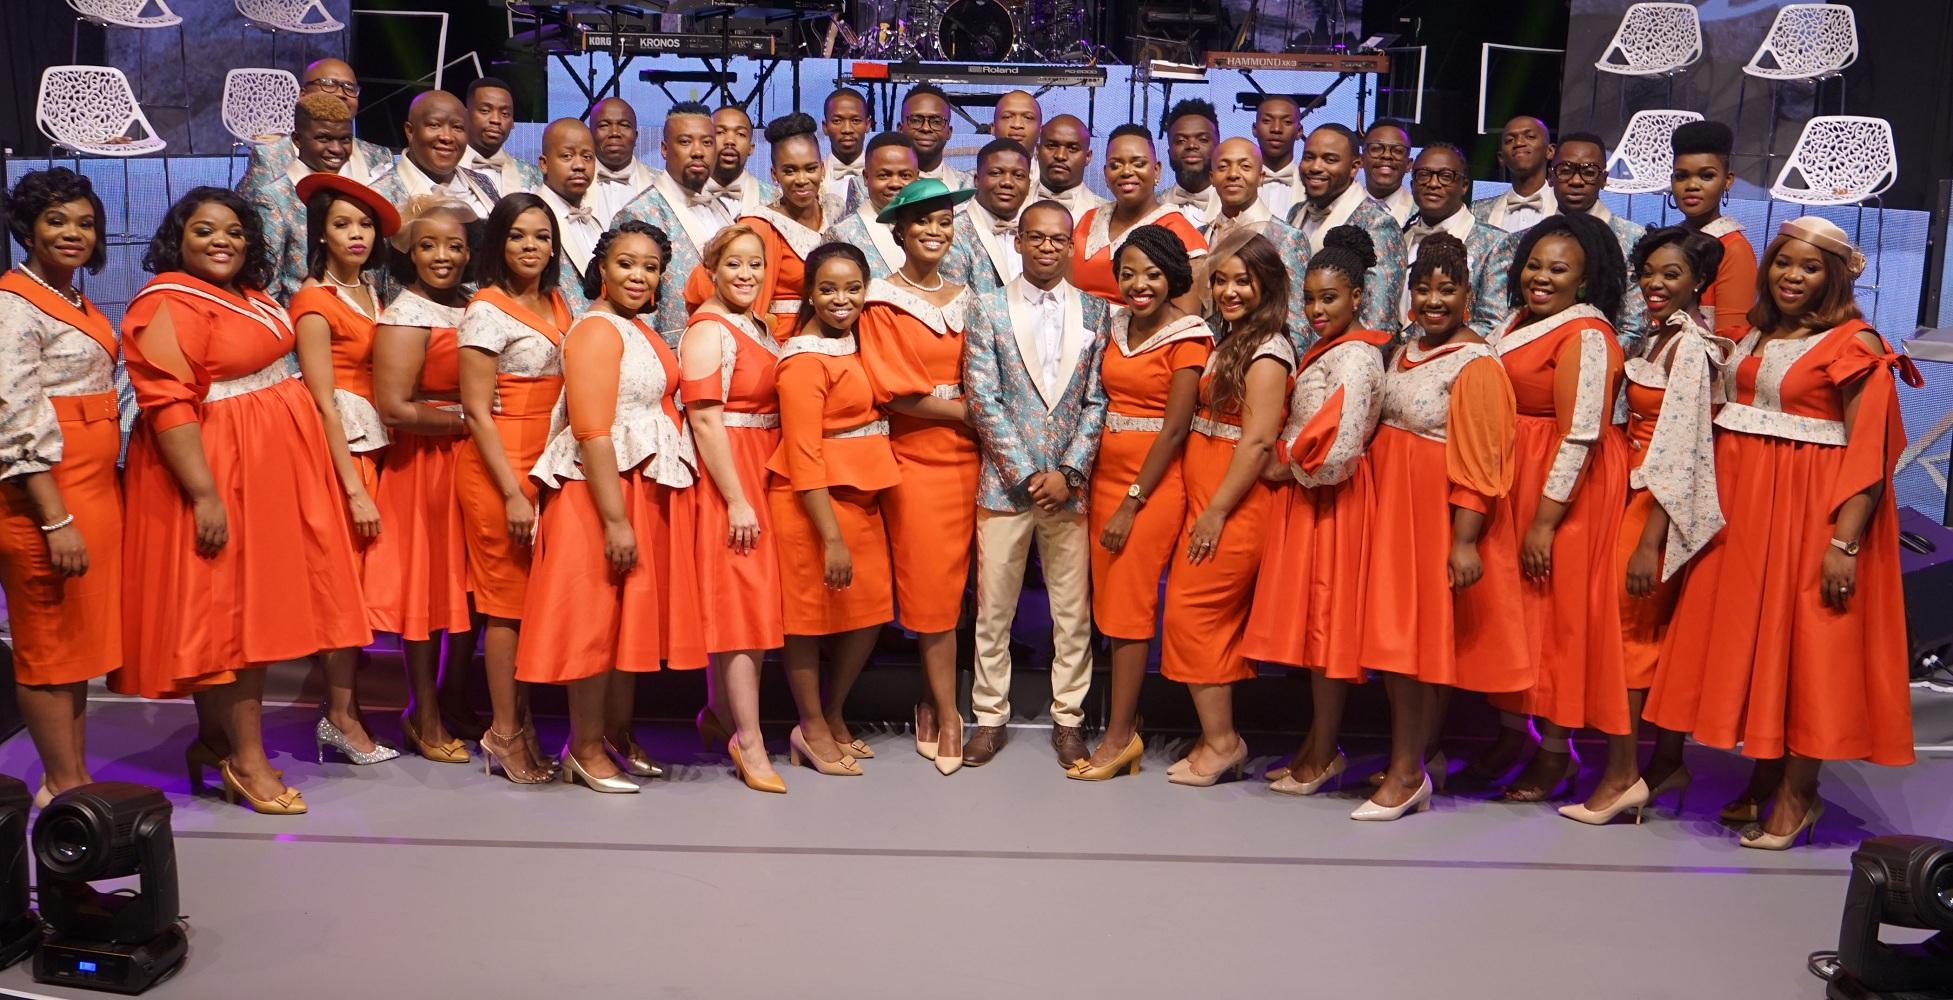 South African Gospel choir Group Joyous Celebration 25